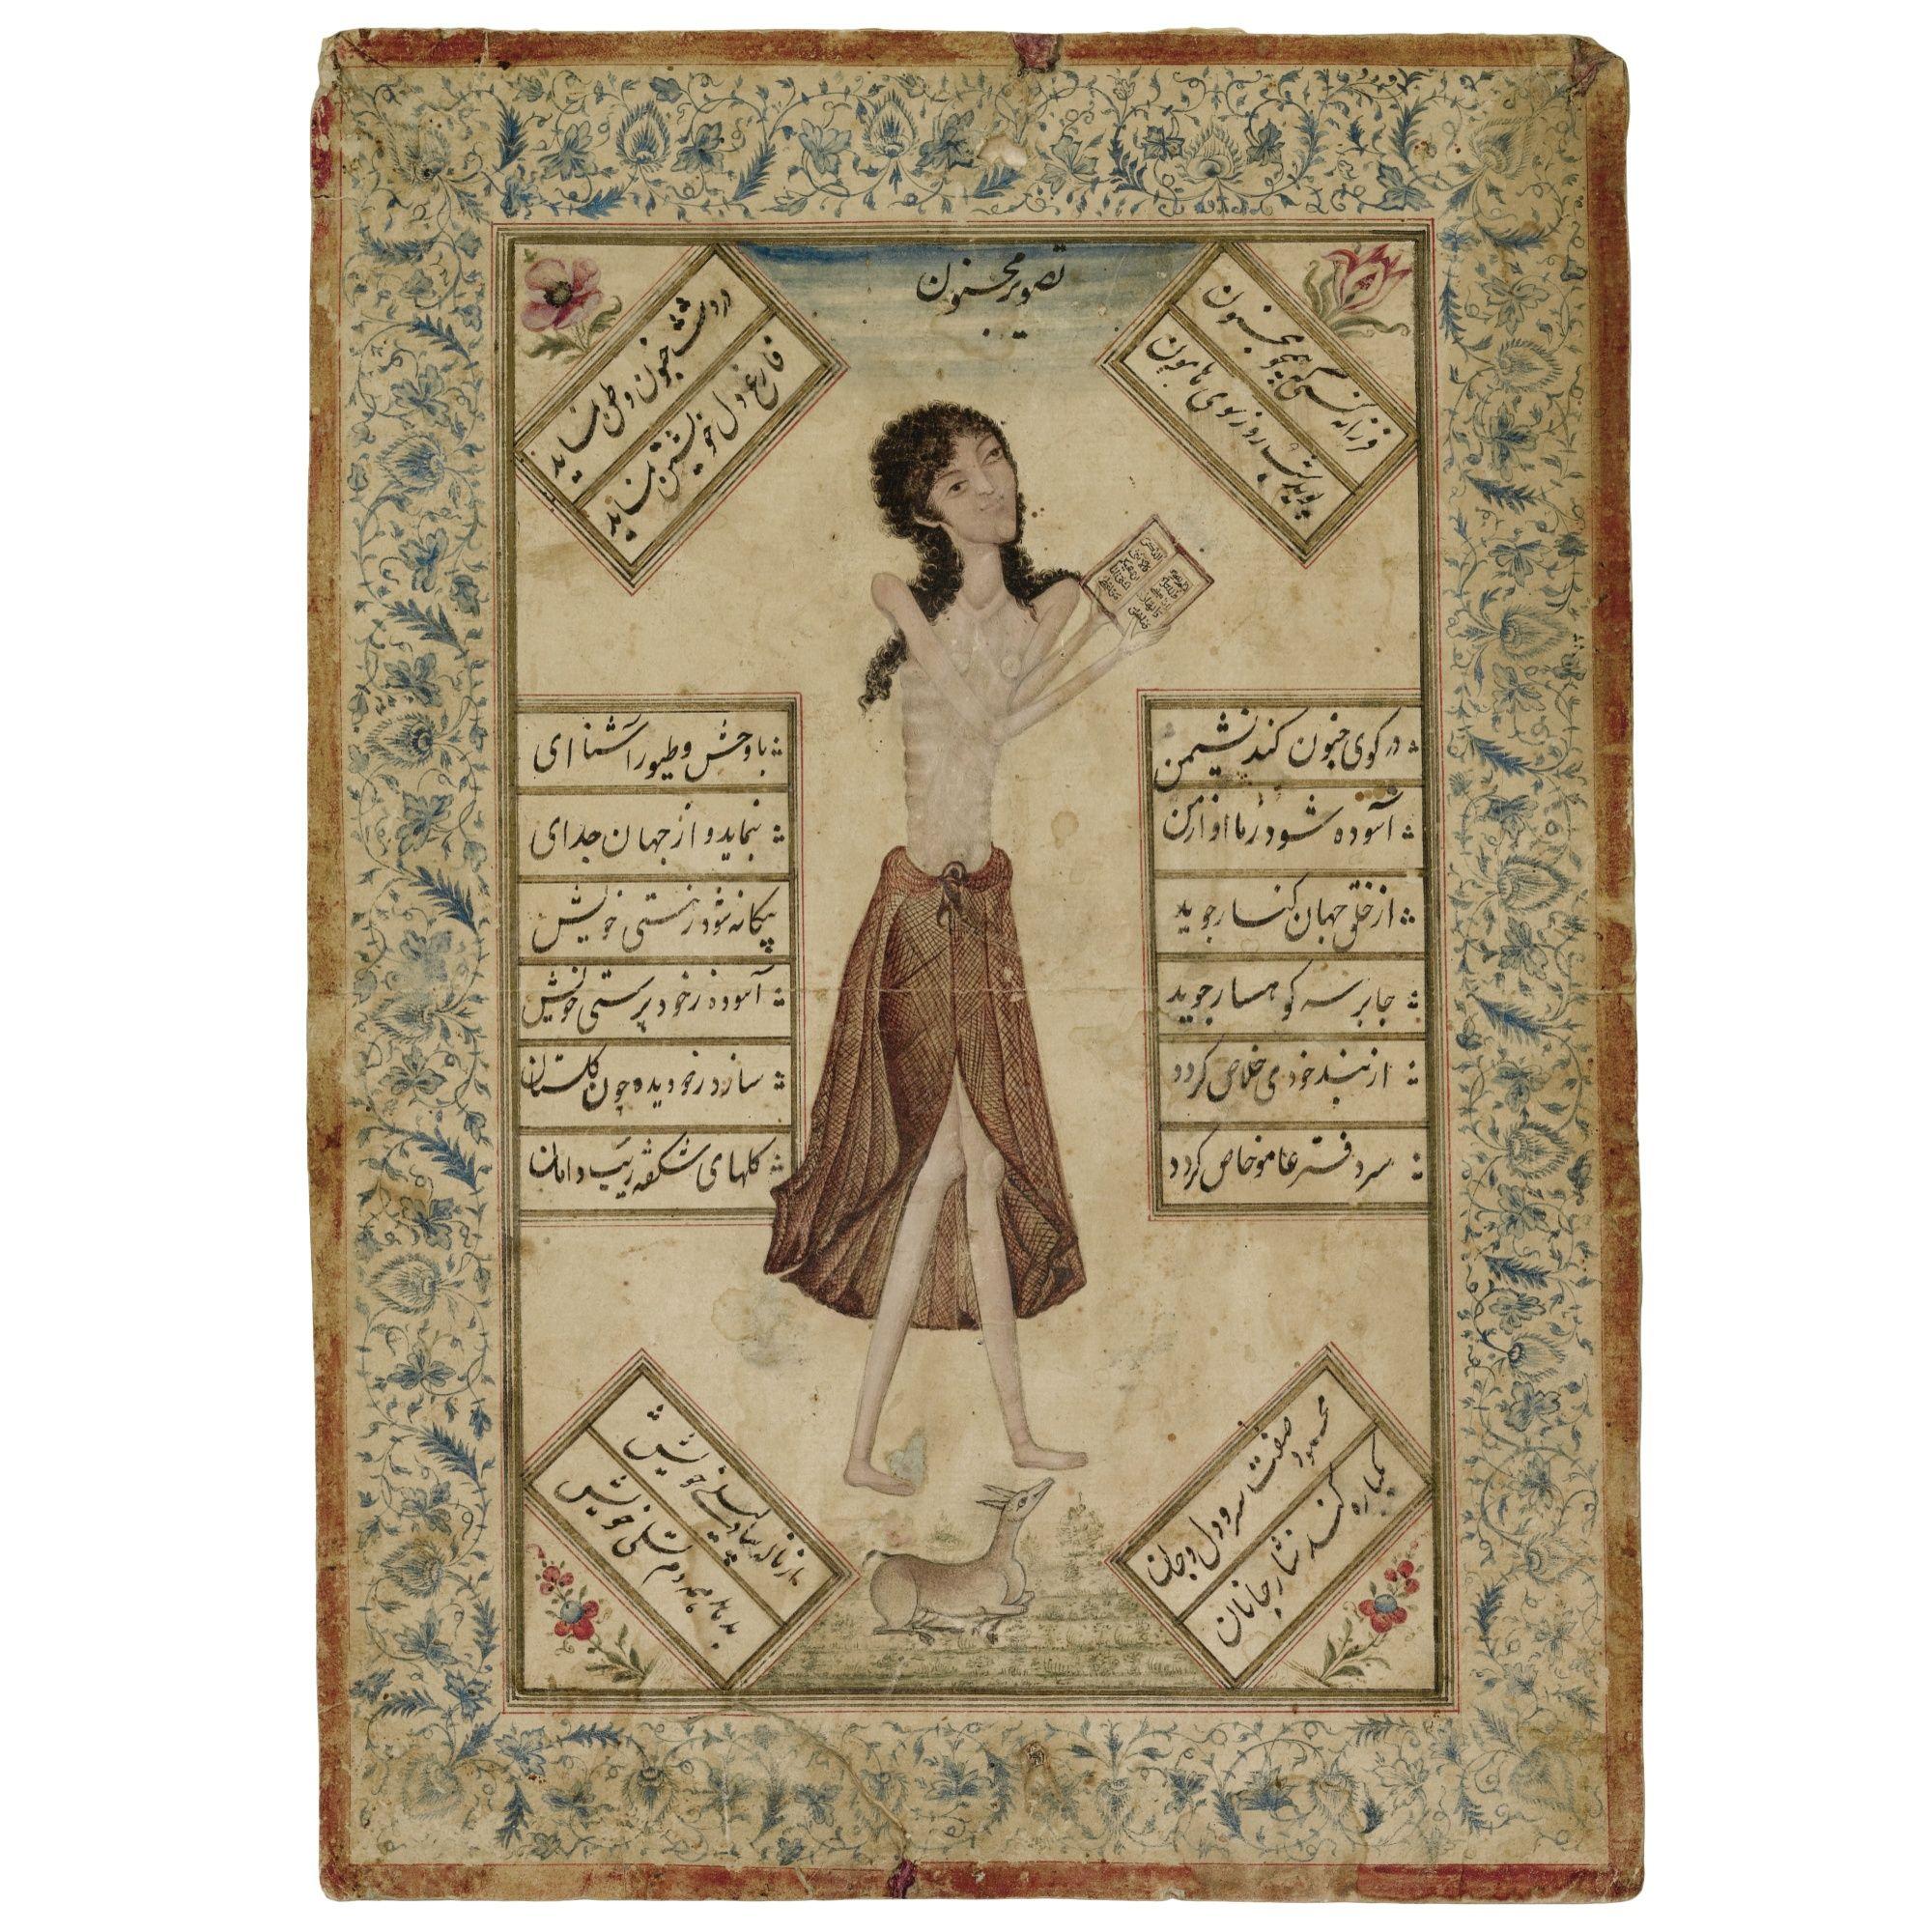 AN IMAGE OF MAJNUN WITH VERSES FROM THE POEM LAYLA VA MAJNUN, PERSIA, 19TH CENTURY | lot | Sotheby's